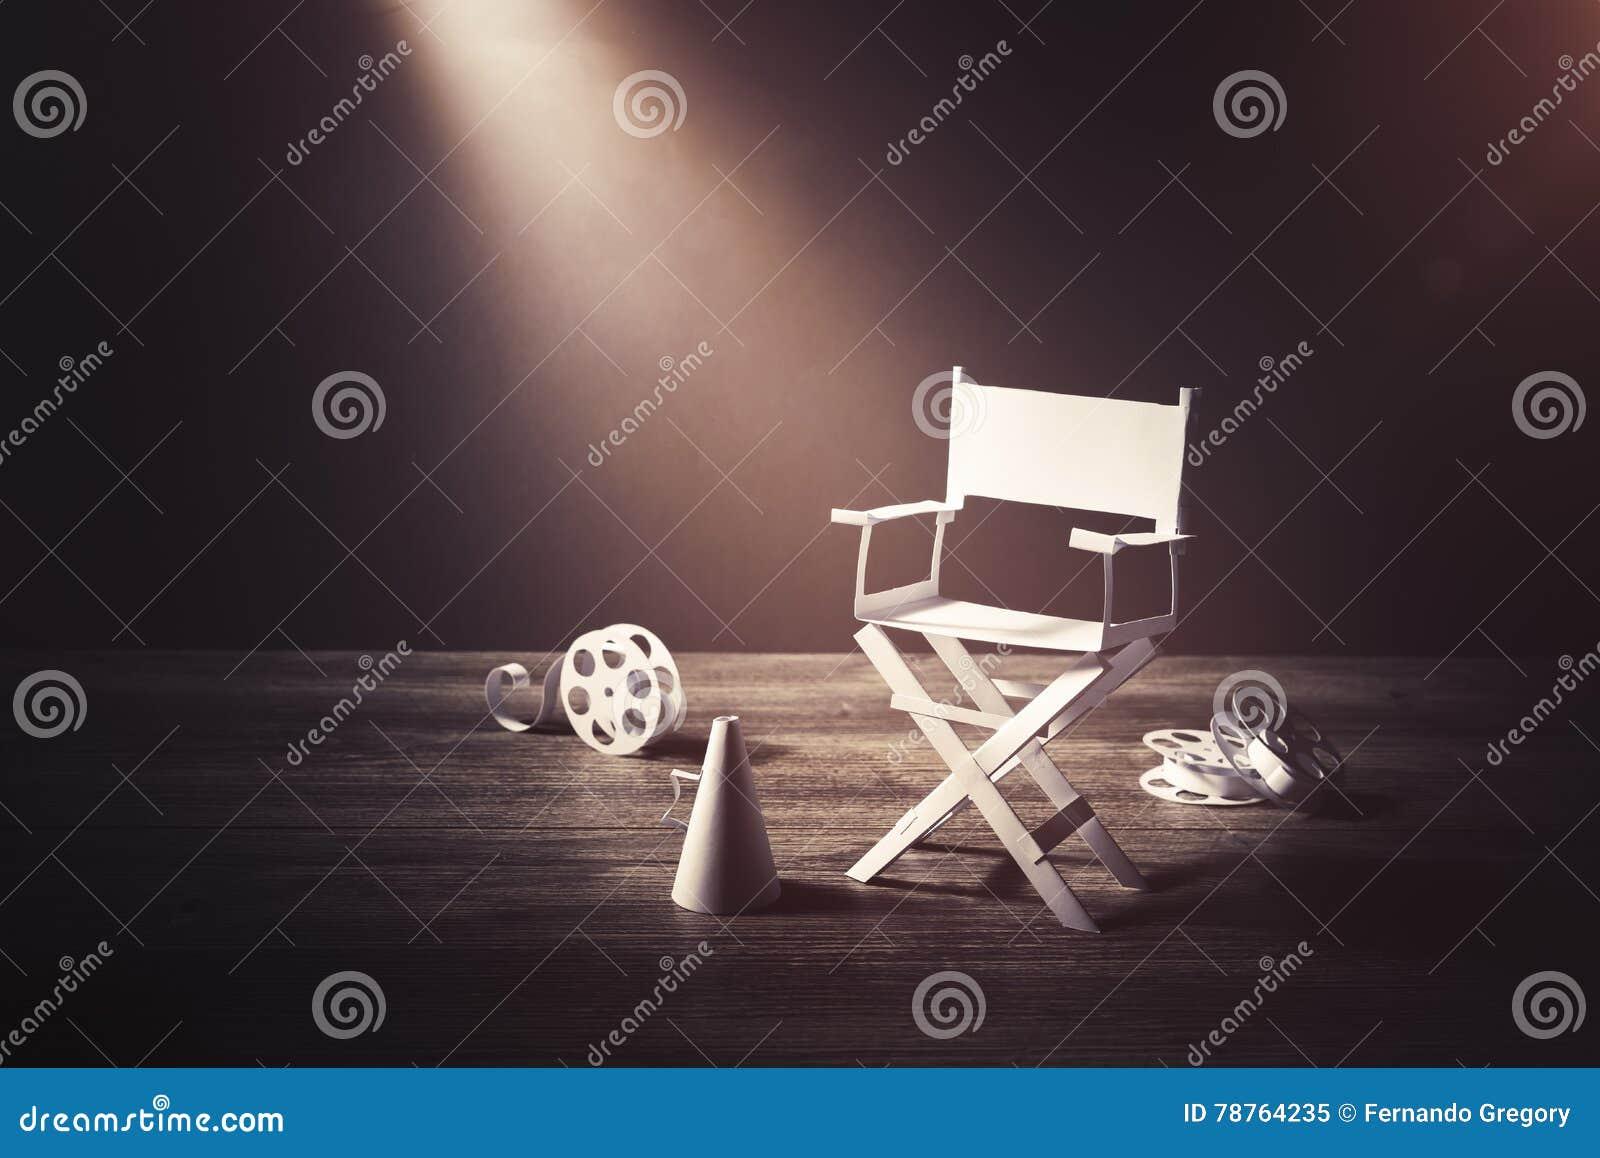 contrast movie